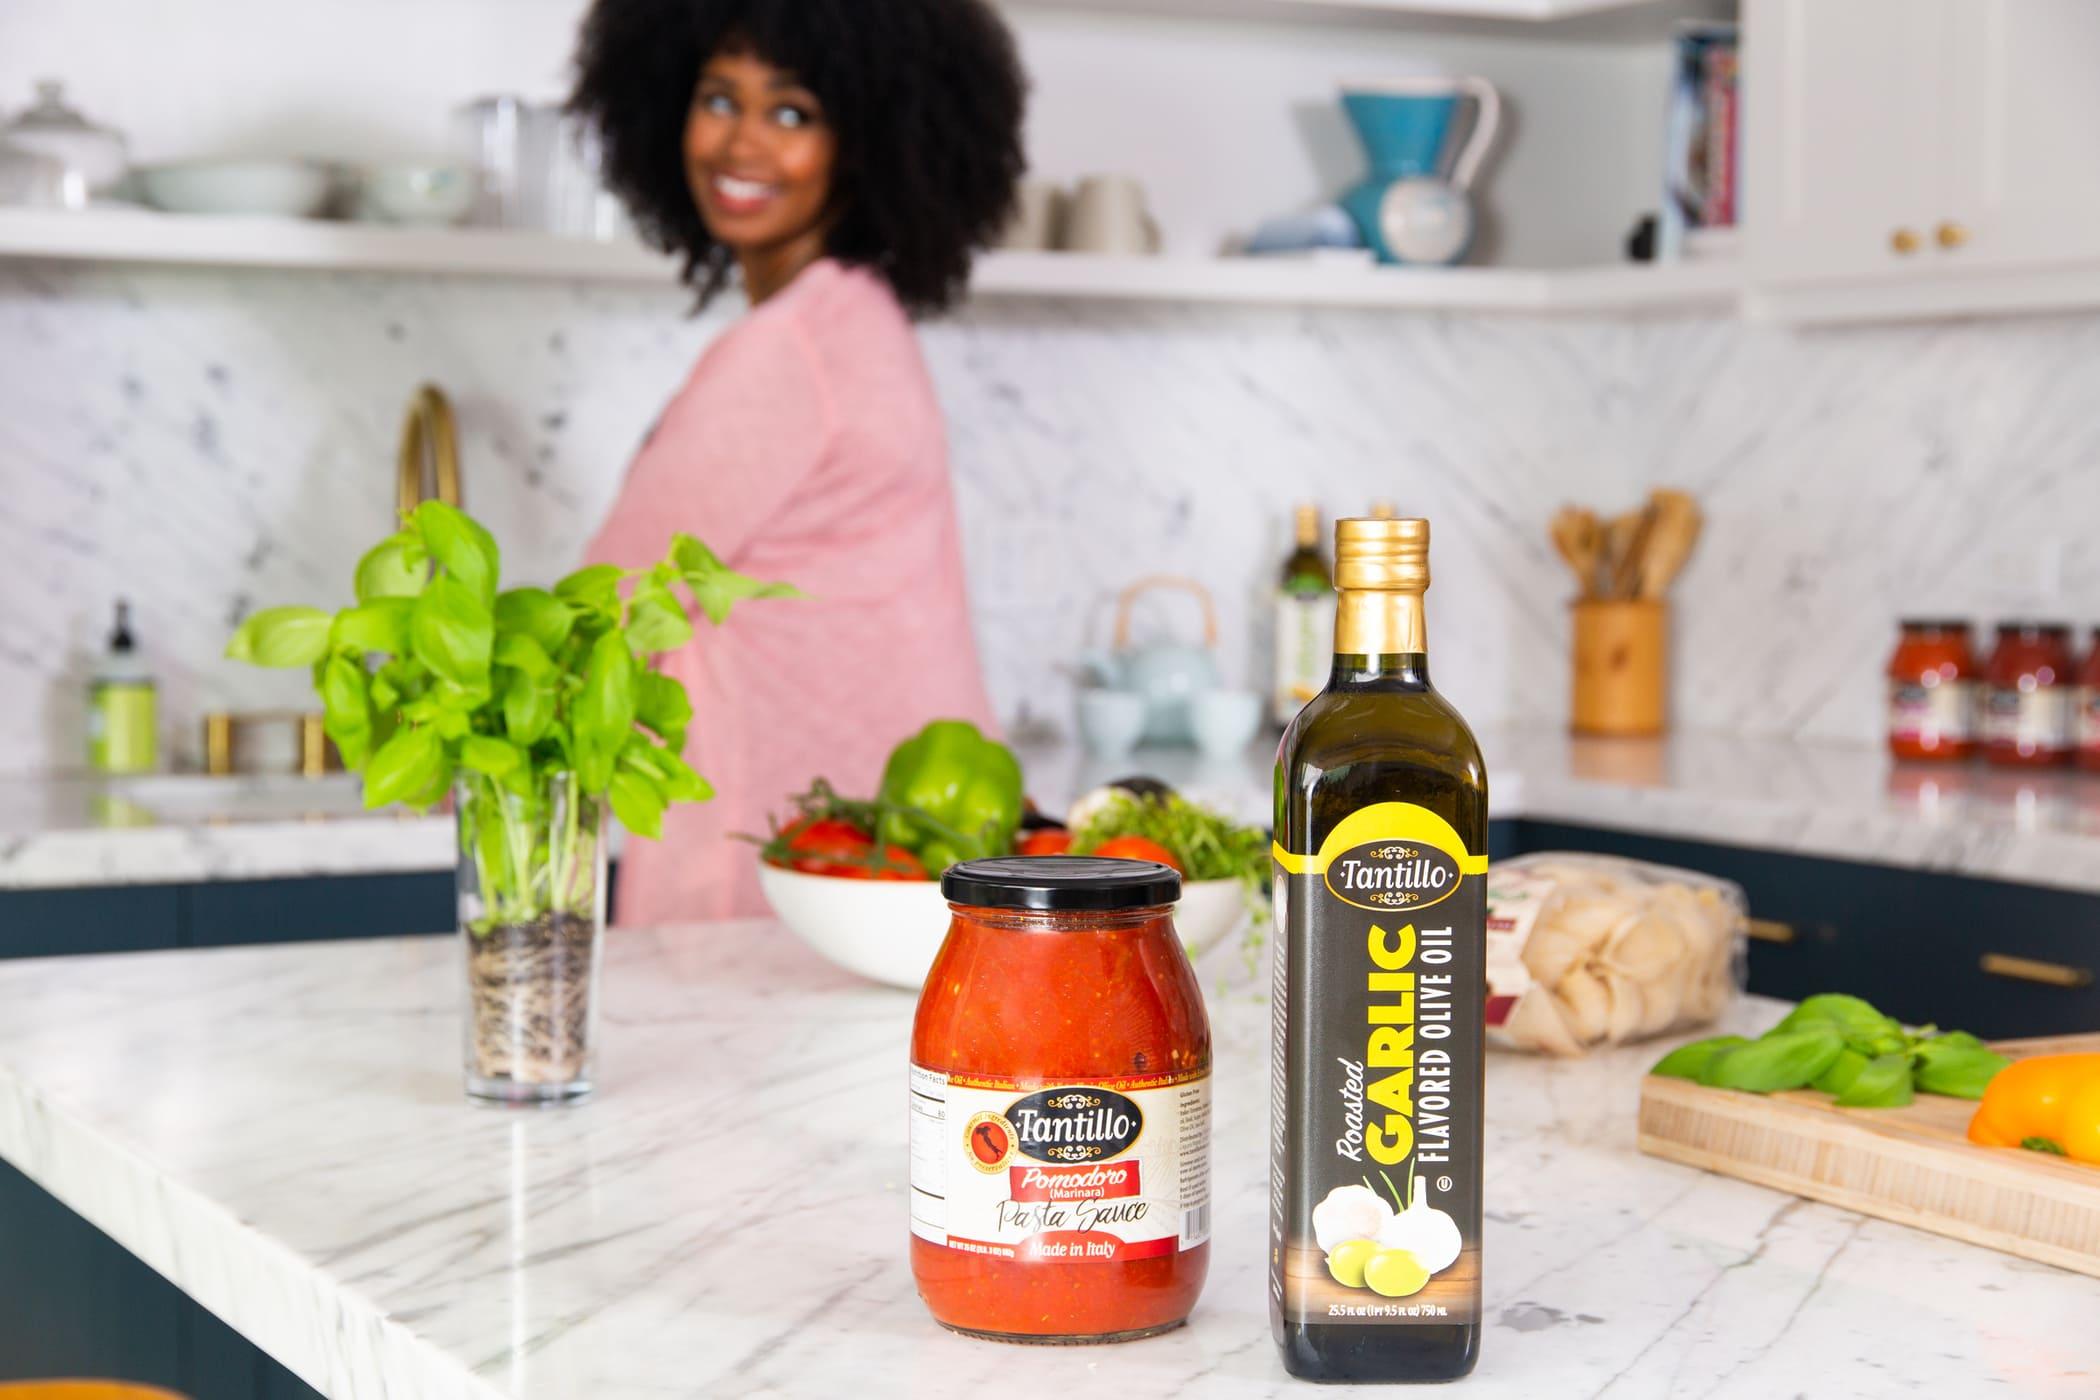 Pomodoro And Garlic Oil